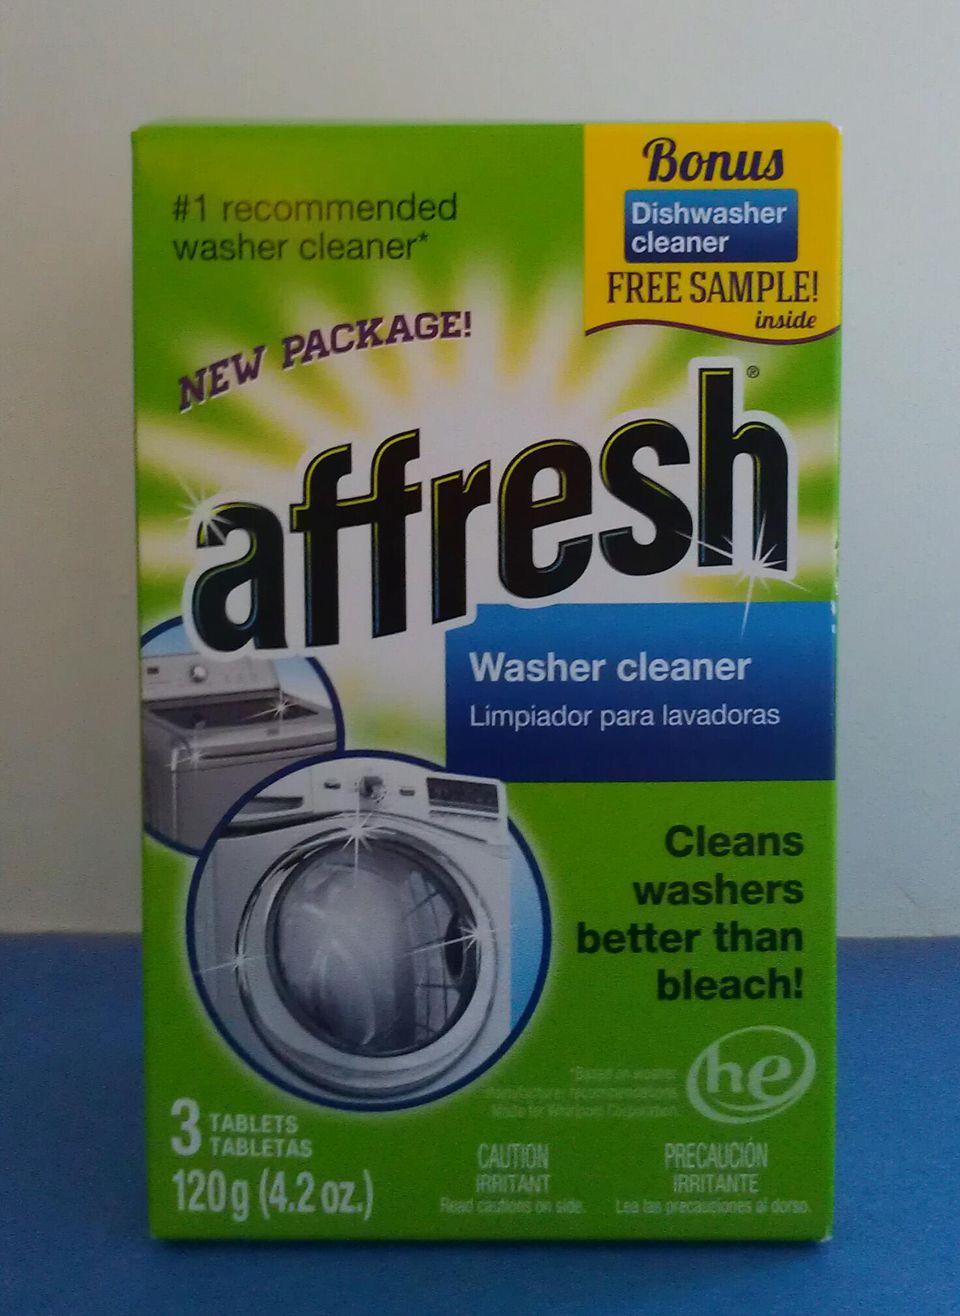 Box of Affresh Washer Cleaner.